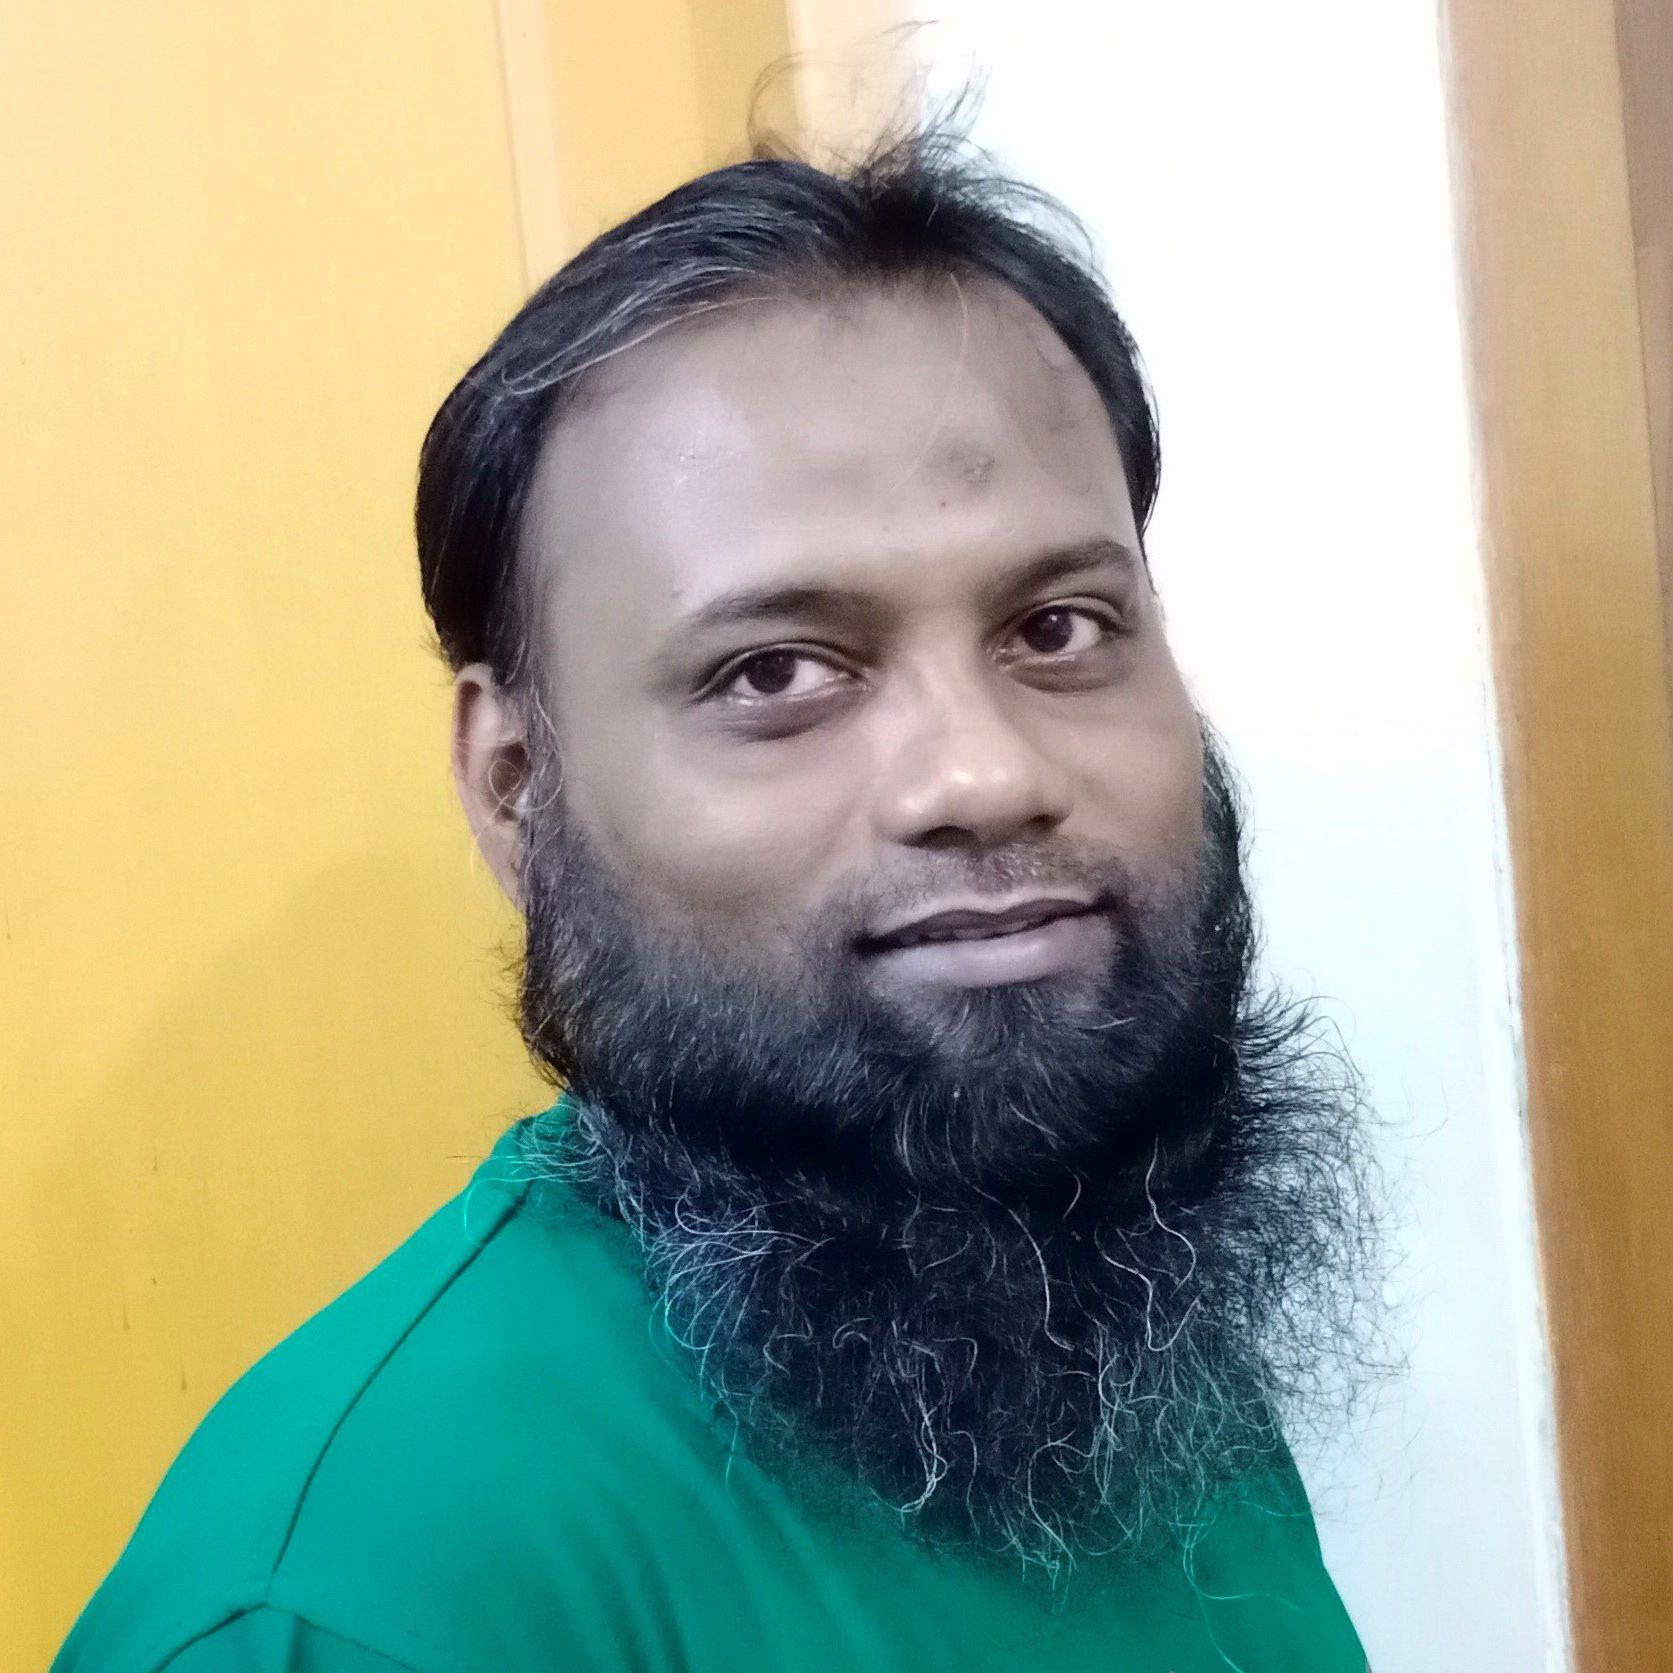 ABM MOFAKHKHARUL ISLAM